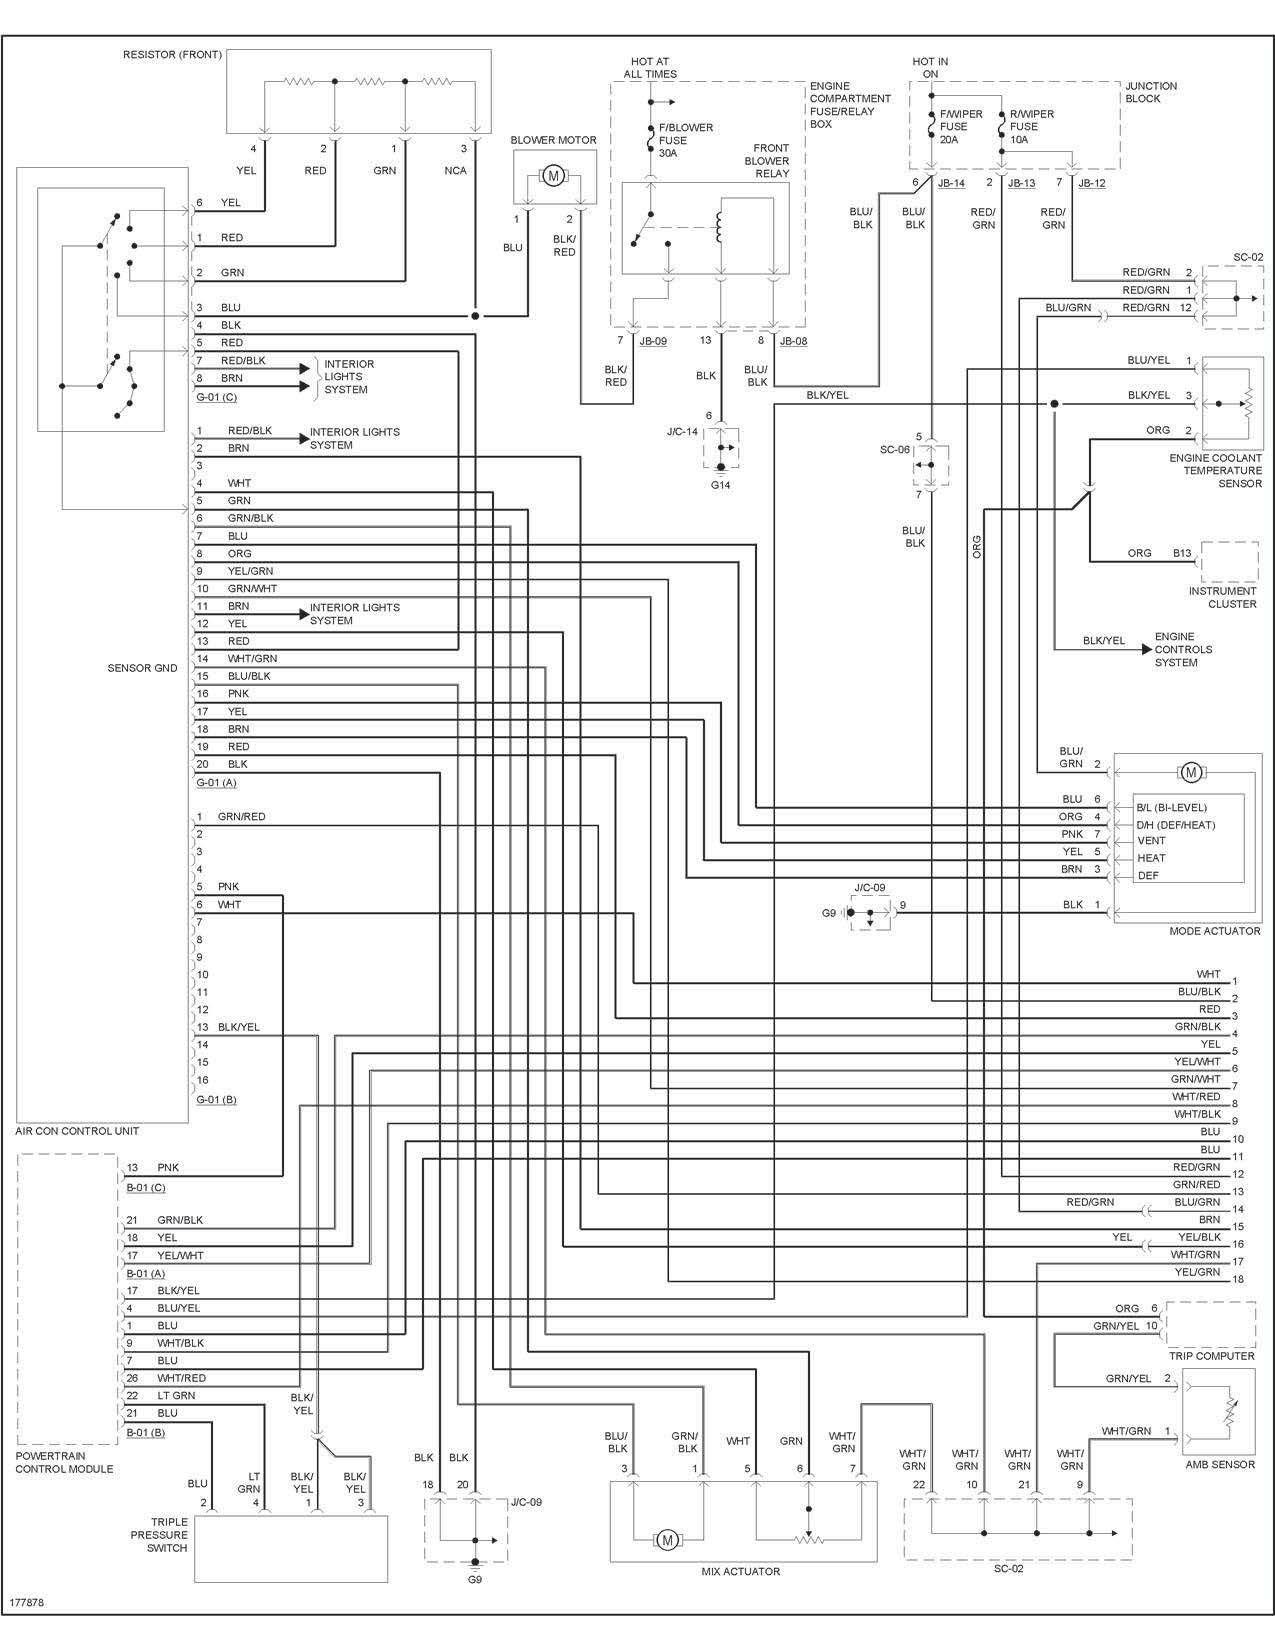 Kia Sportage 2 0 Tdi Wiring Diagram   DATABASE Wiring Diagrams library   Sportage Wiring Schematic      wiring diagram library